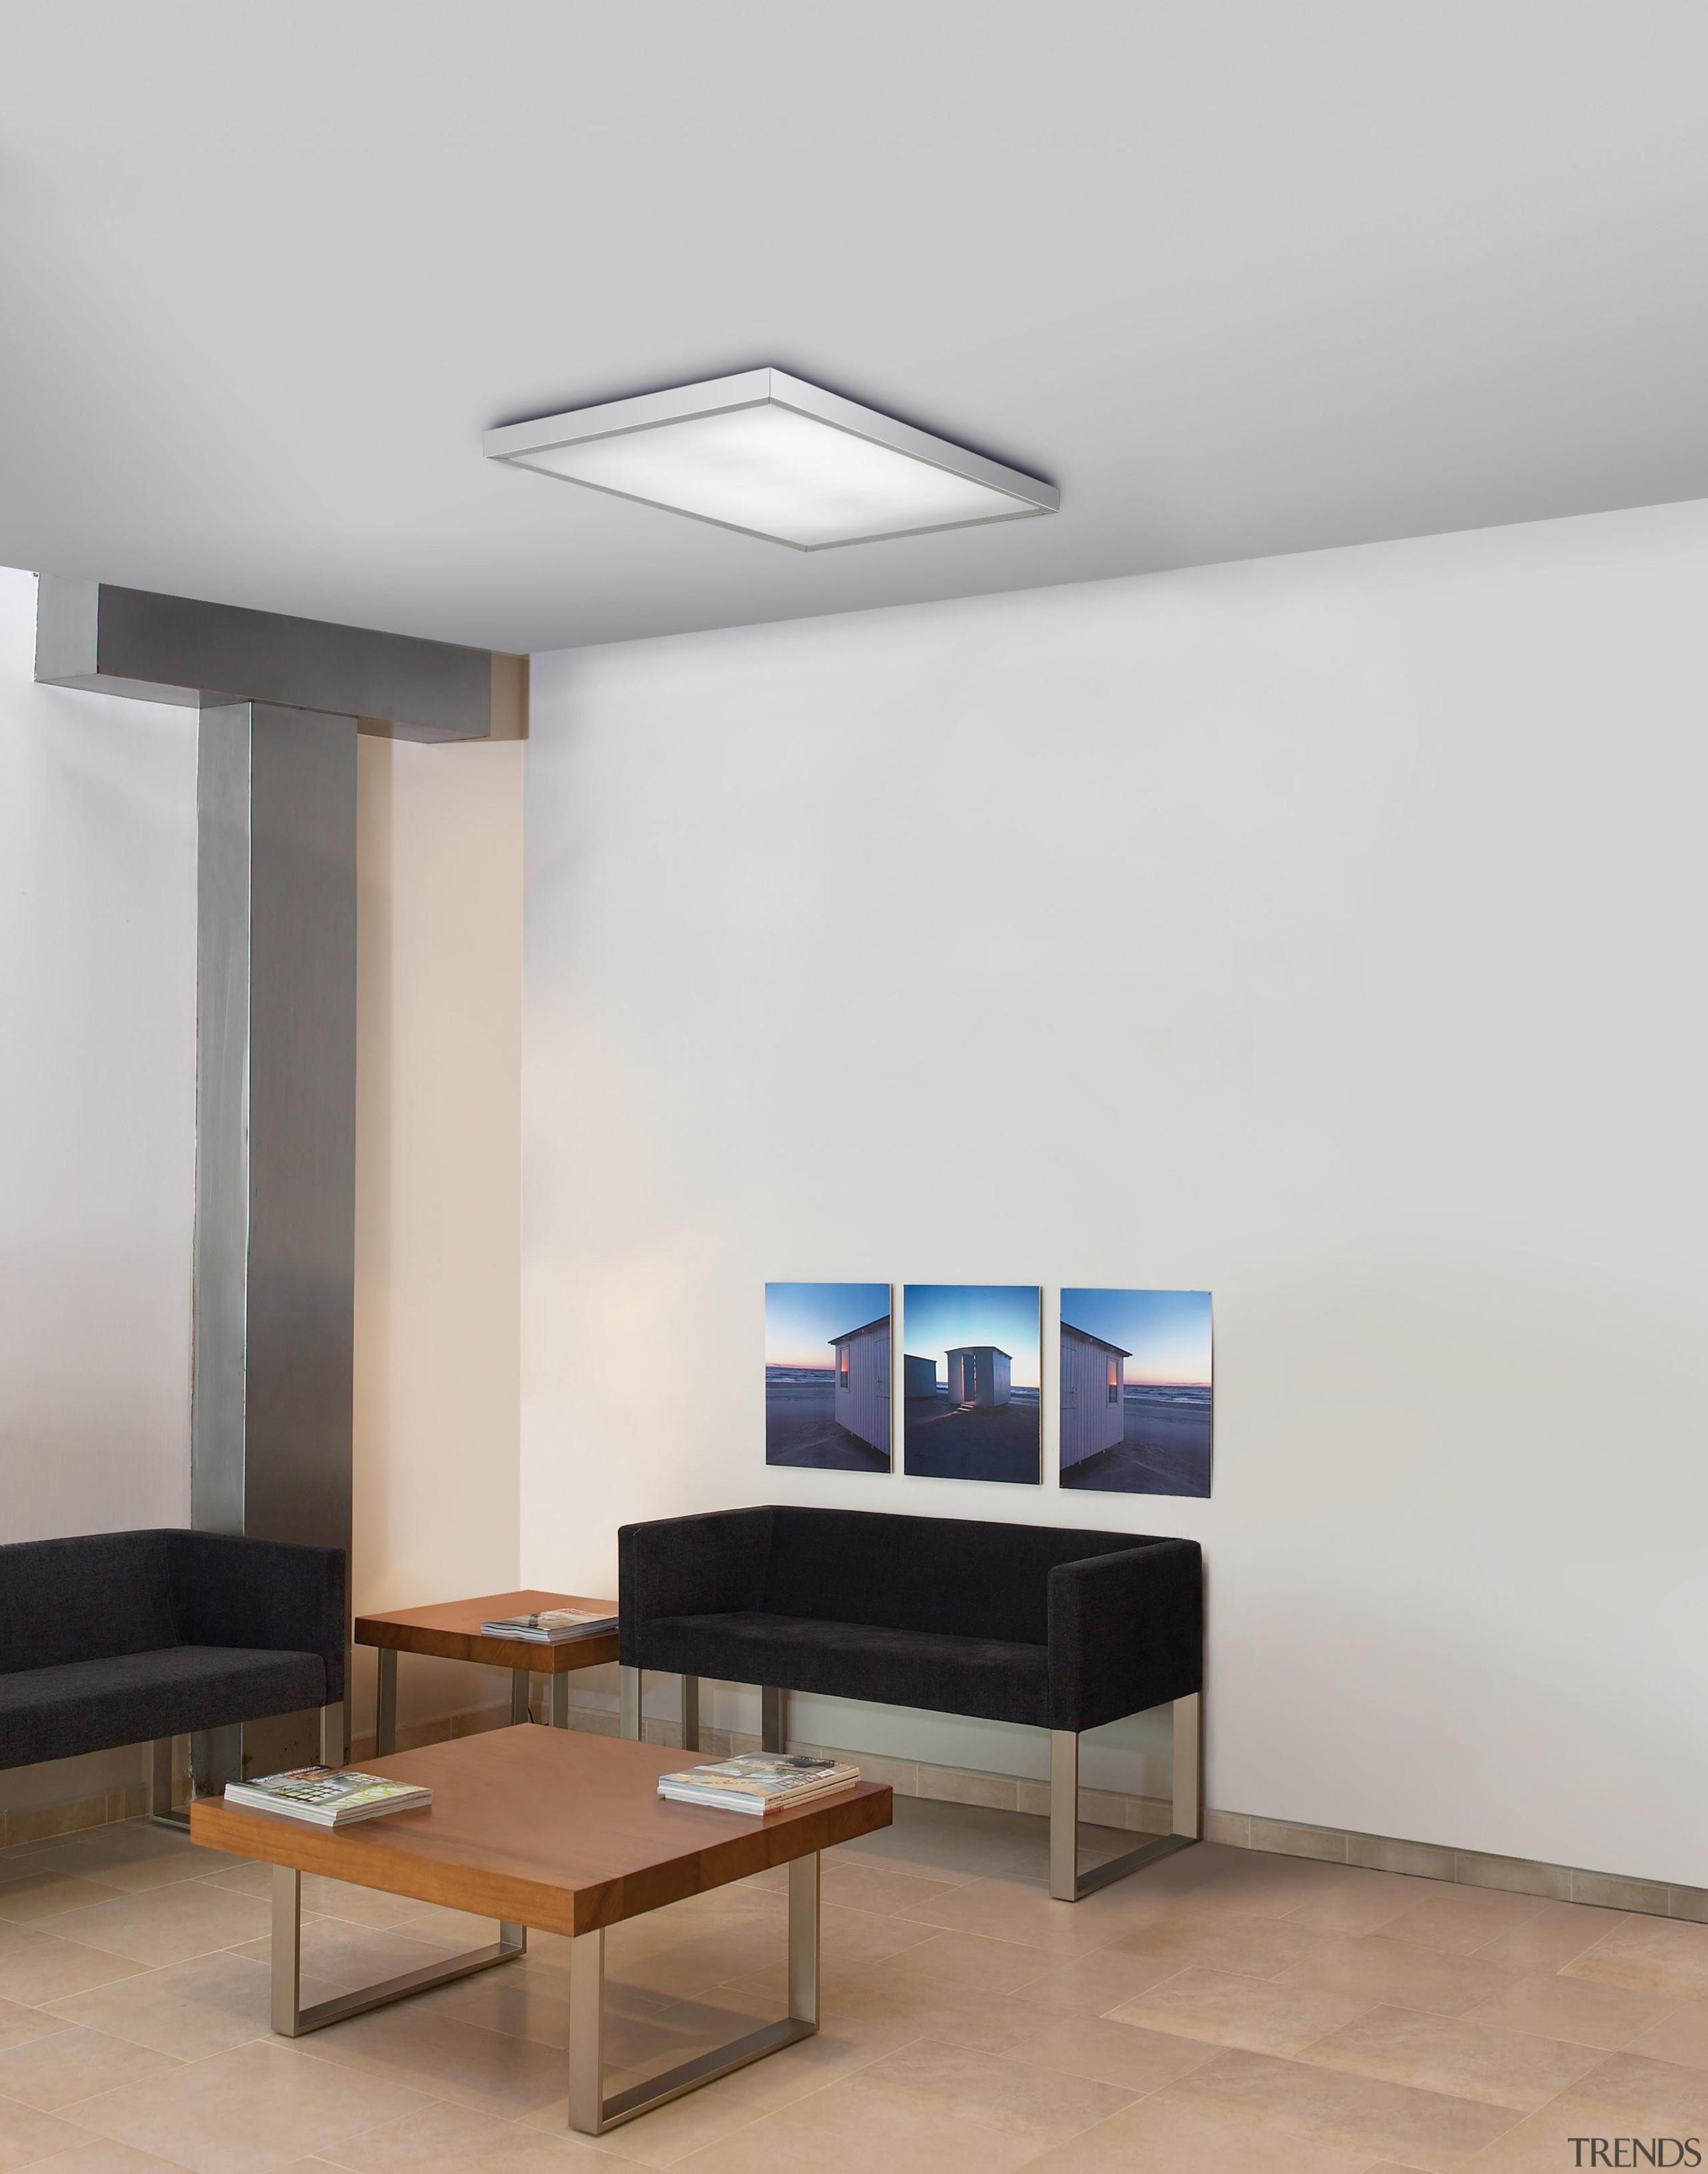 Toledo from La Creu, Spain - Ceiling Lights ceiling, daylighting, floor, furniture, interior design, light fixture, lighting, product design, table, wall, white, gray